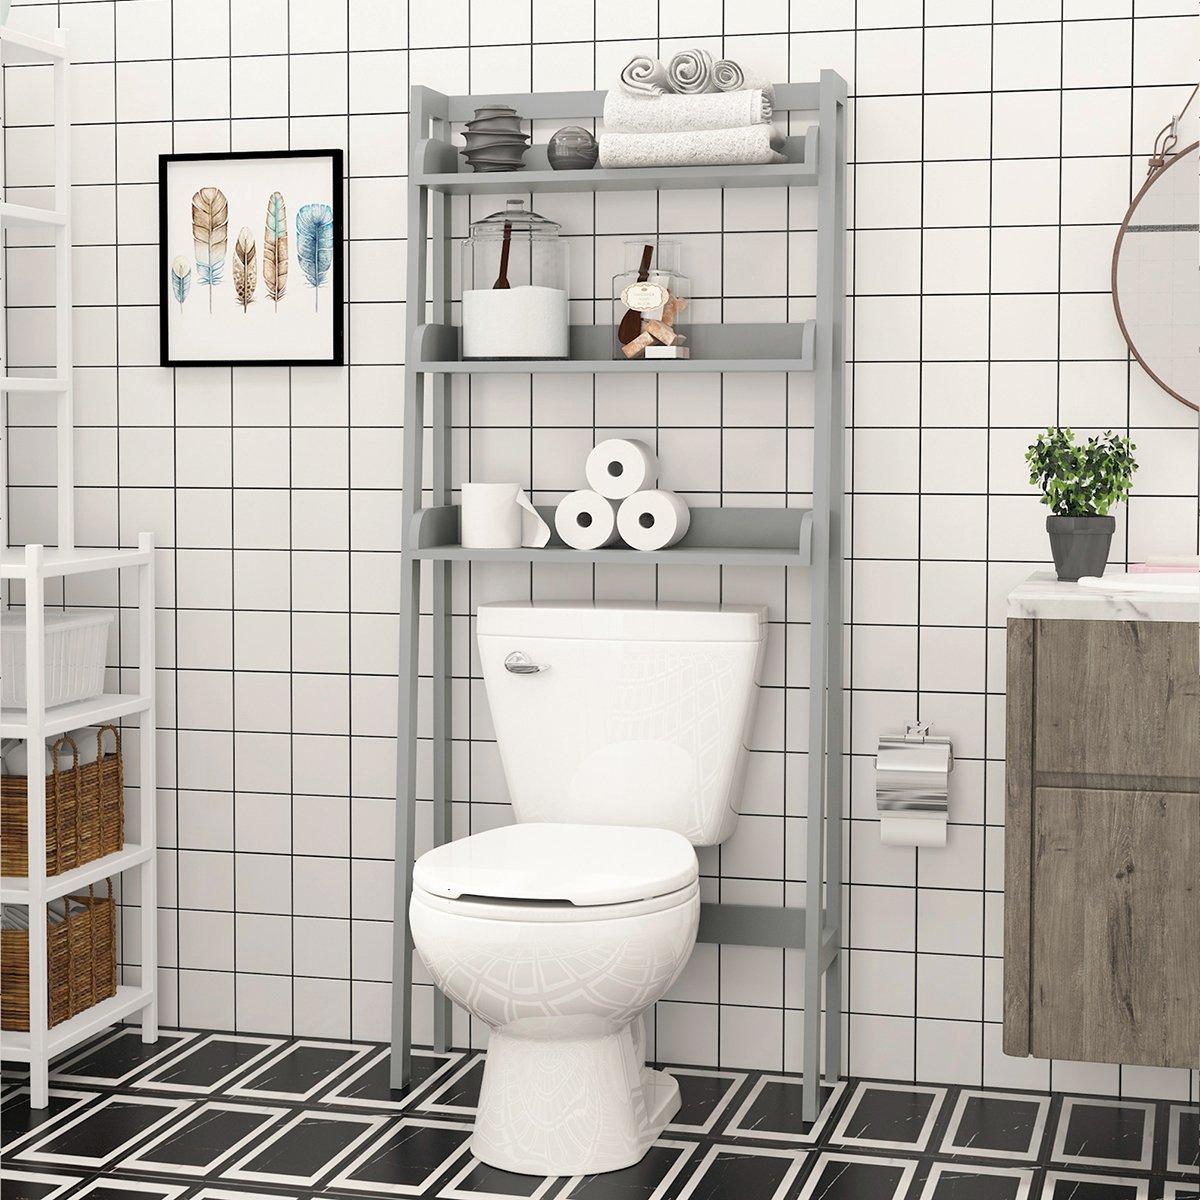 UTEX 3-Shelf Bathroom Organizer over the Toilet, Bathroom Spacesaver (Gray)